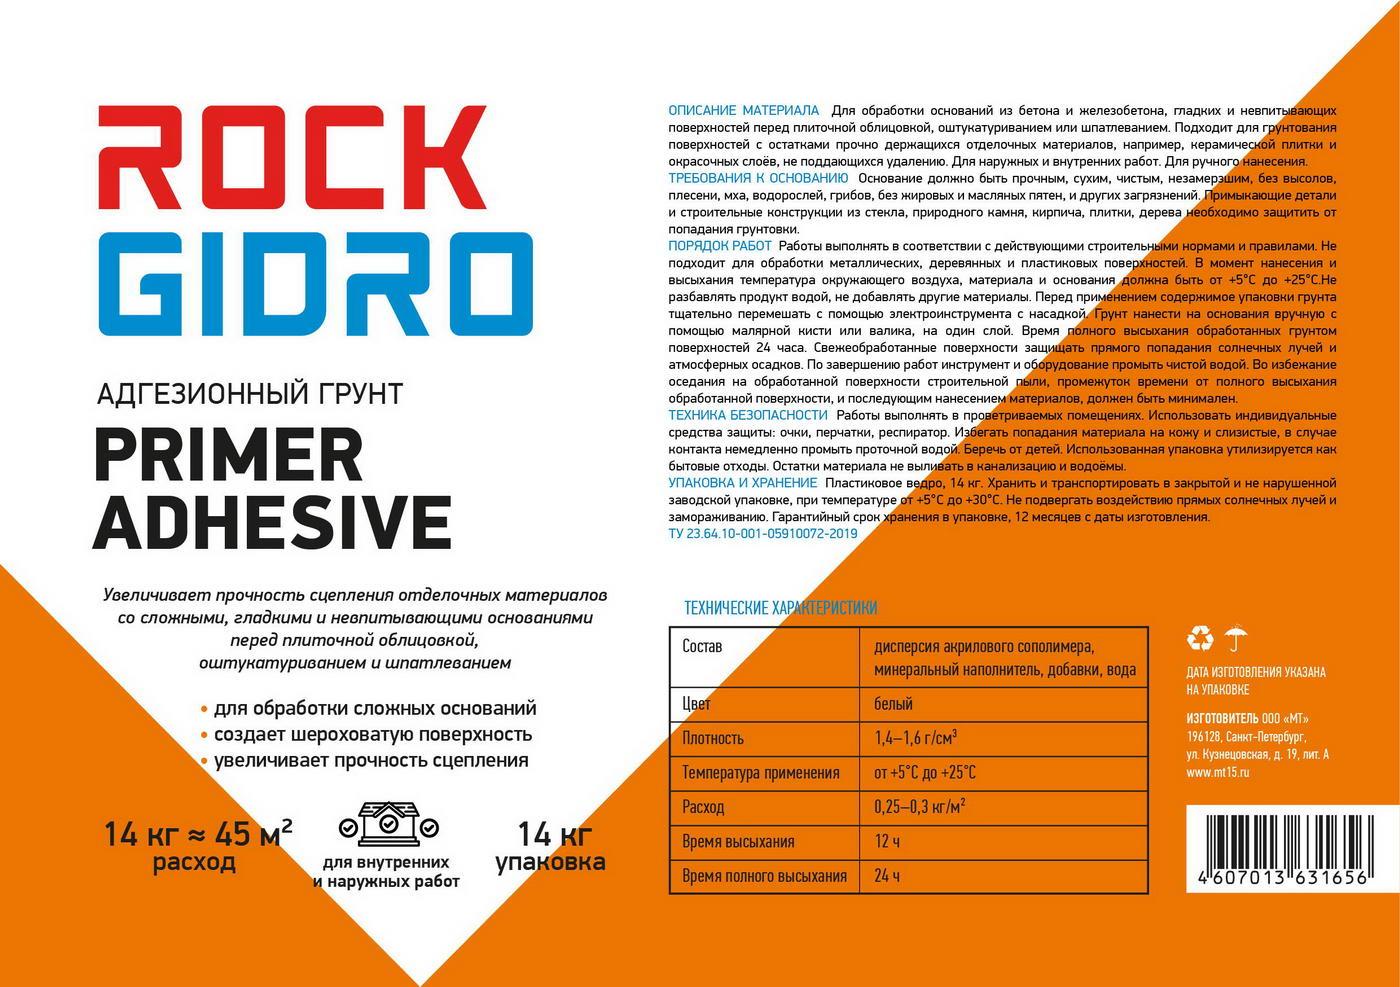 RockGidro 용기 라벨 디자인 프라이머